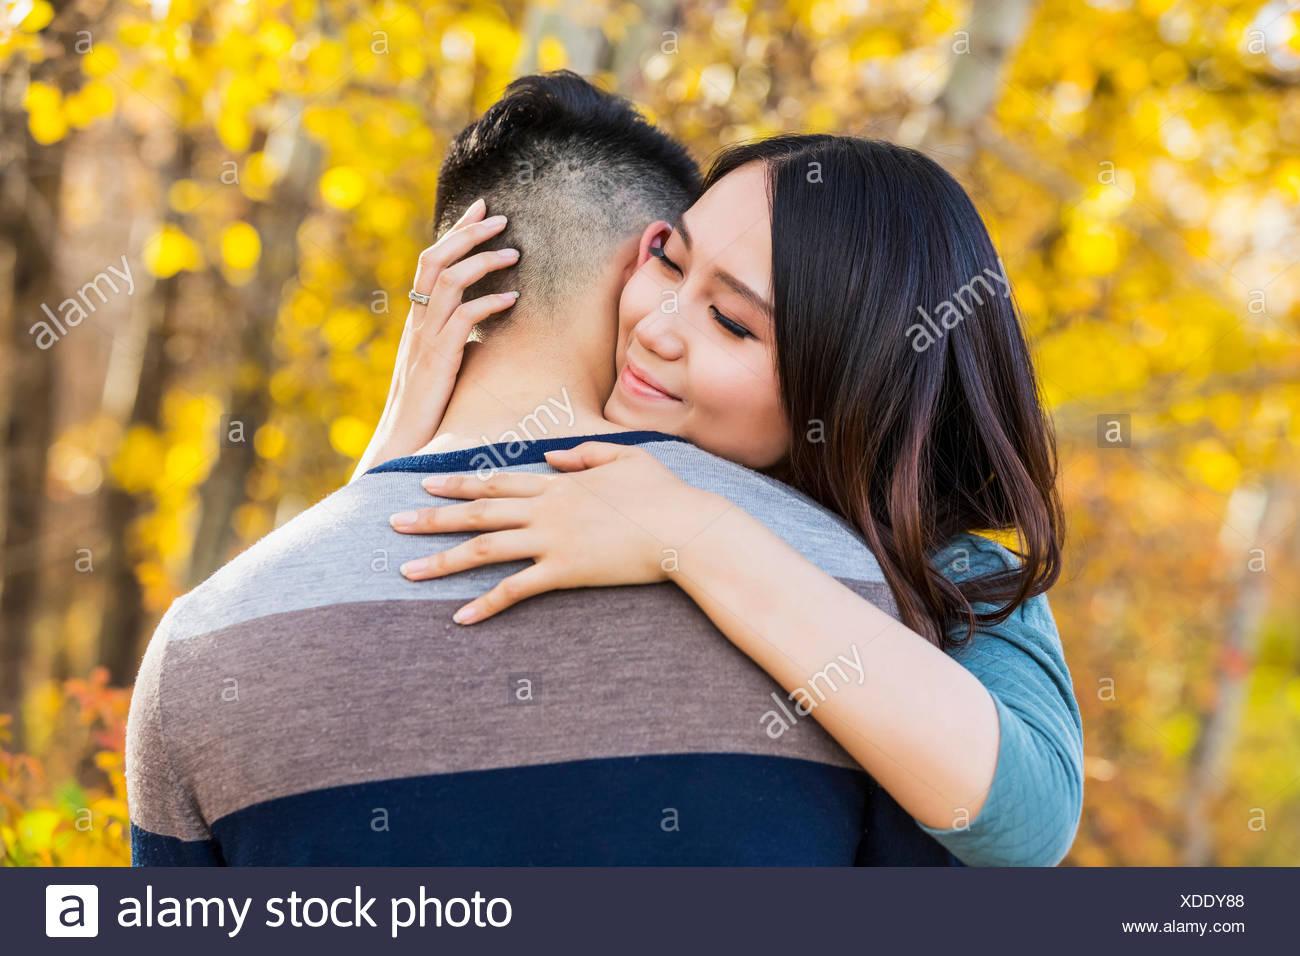 Vammaisten dating